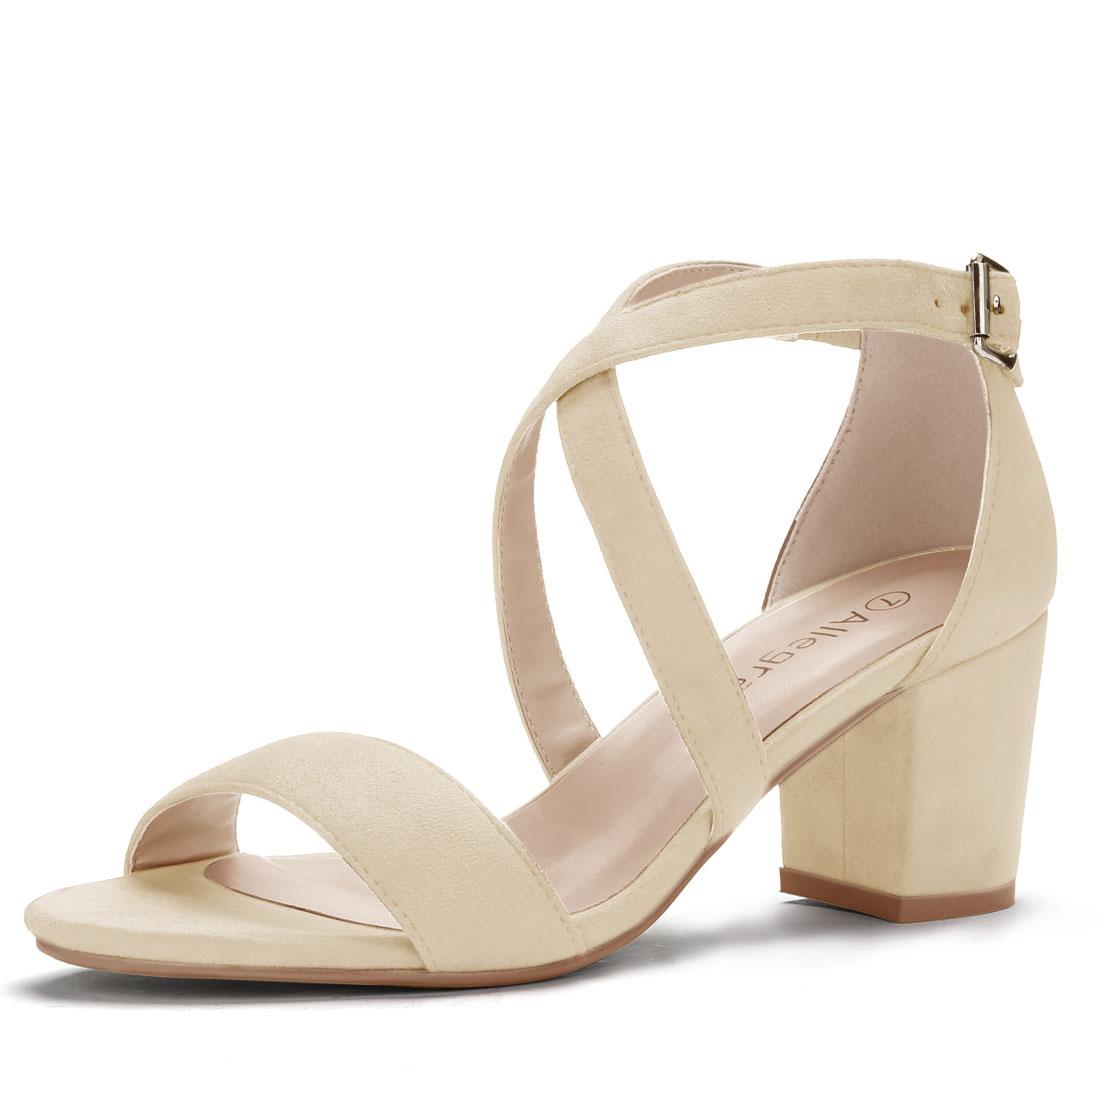 Allegra K Women's Crisscross Straps Mid Heel Ankle Strap Sandals Beige US 8